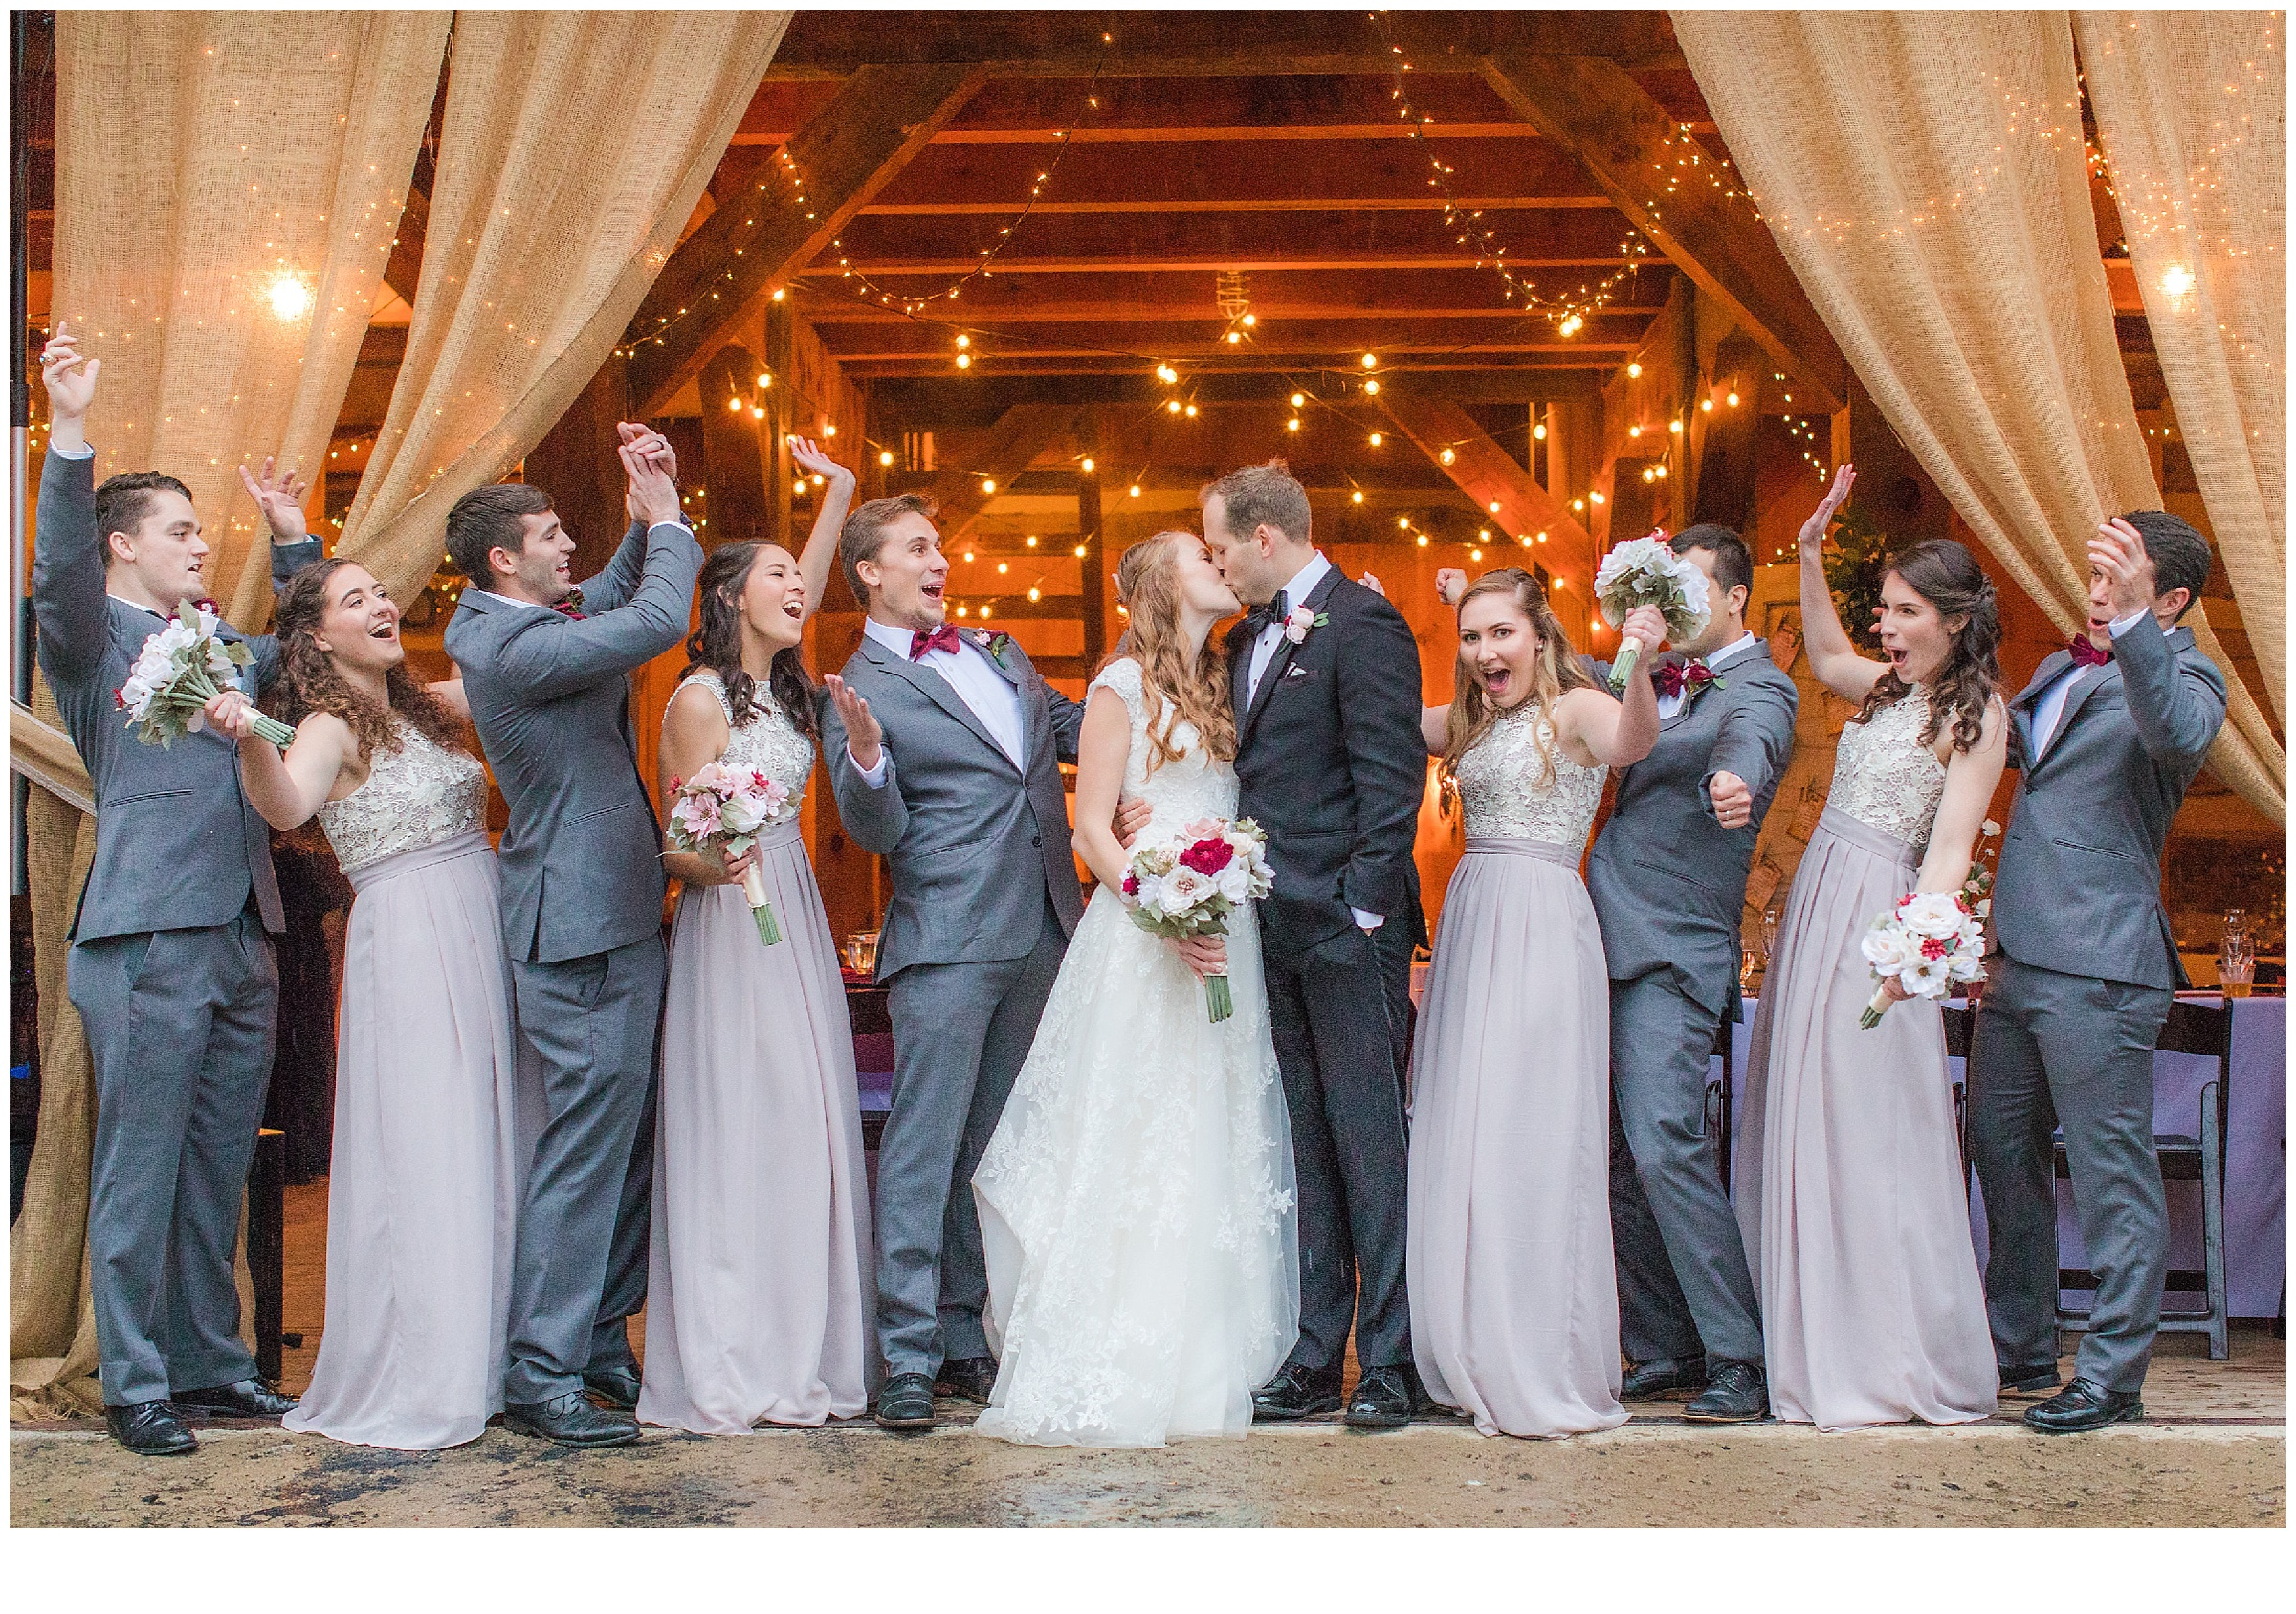 Rainy Wedding Day3.jpg